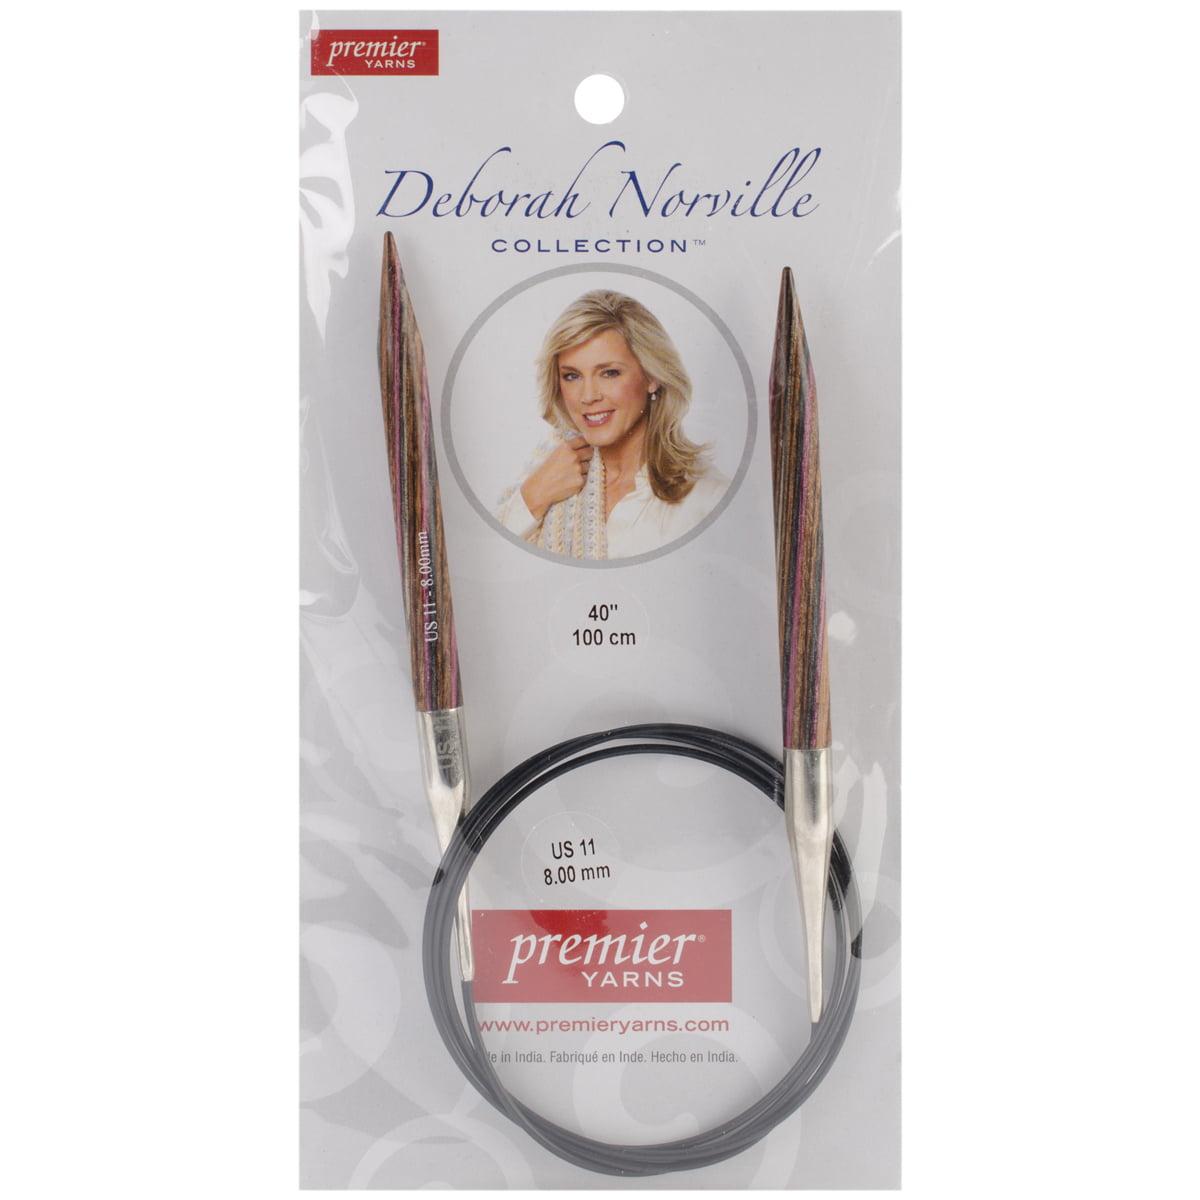 Premier Yarns Deborah Norville 40-Inch Fixed Circular Needles, 11/8.0mm Multi-Colored